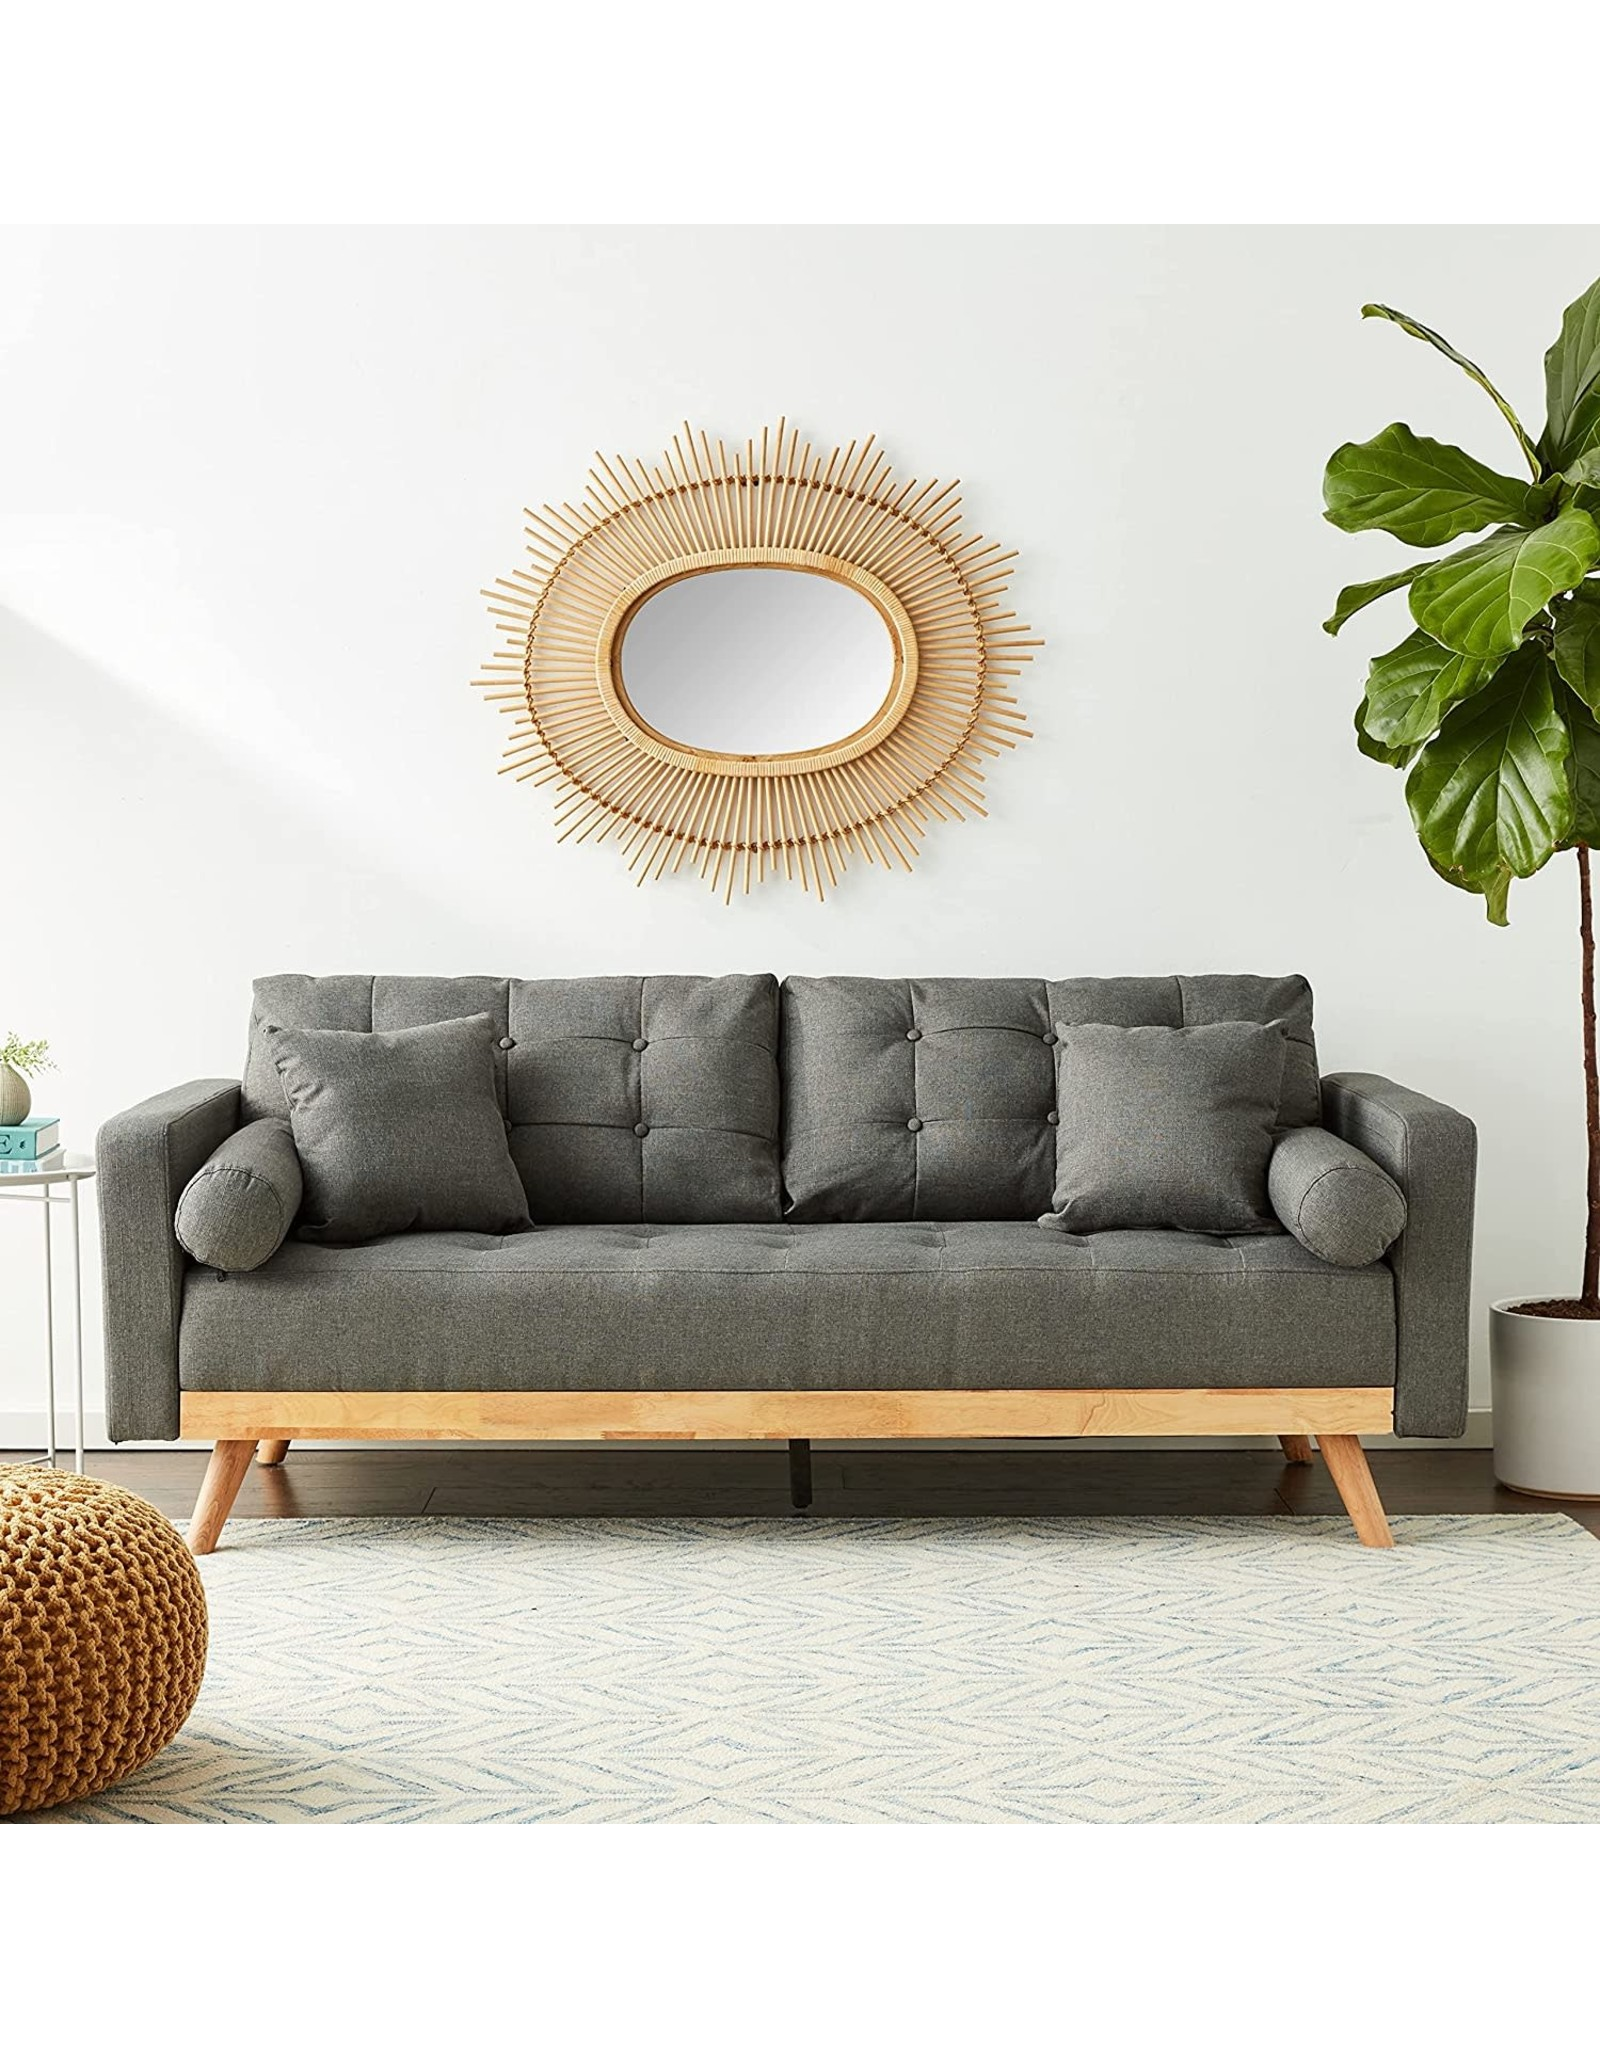 Divano Roma Furniture Divano Roma Furniture Madison Sofas, Dark Grey